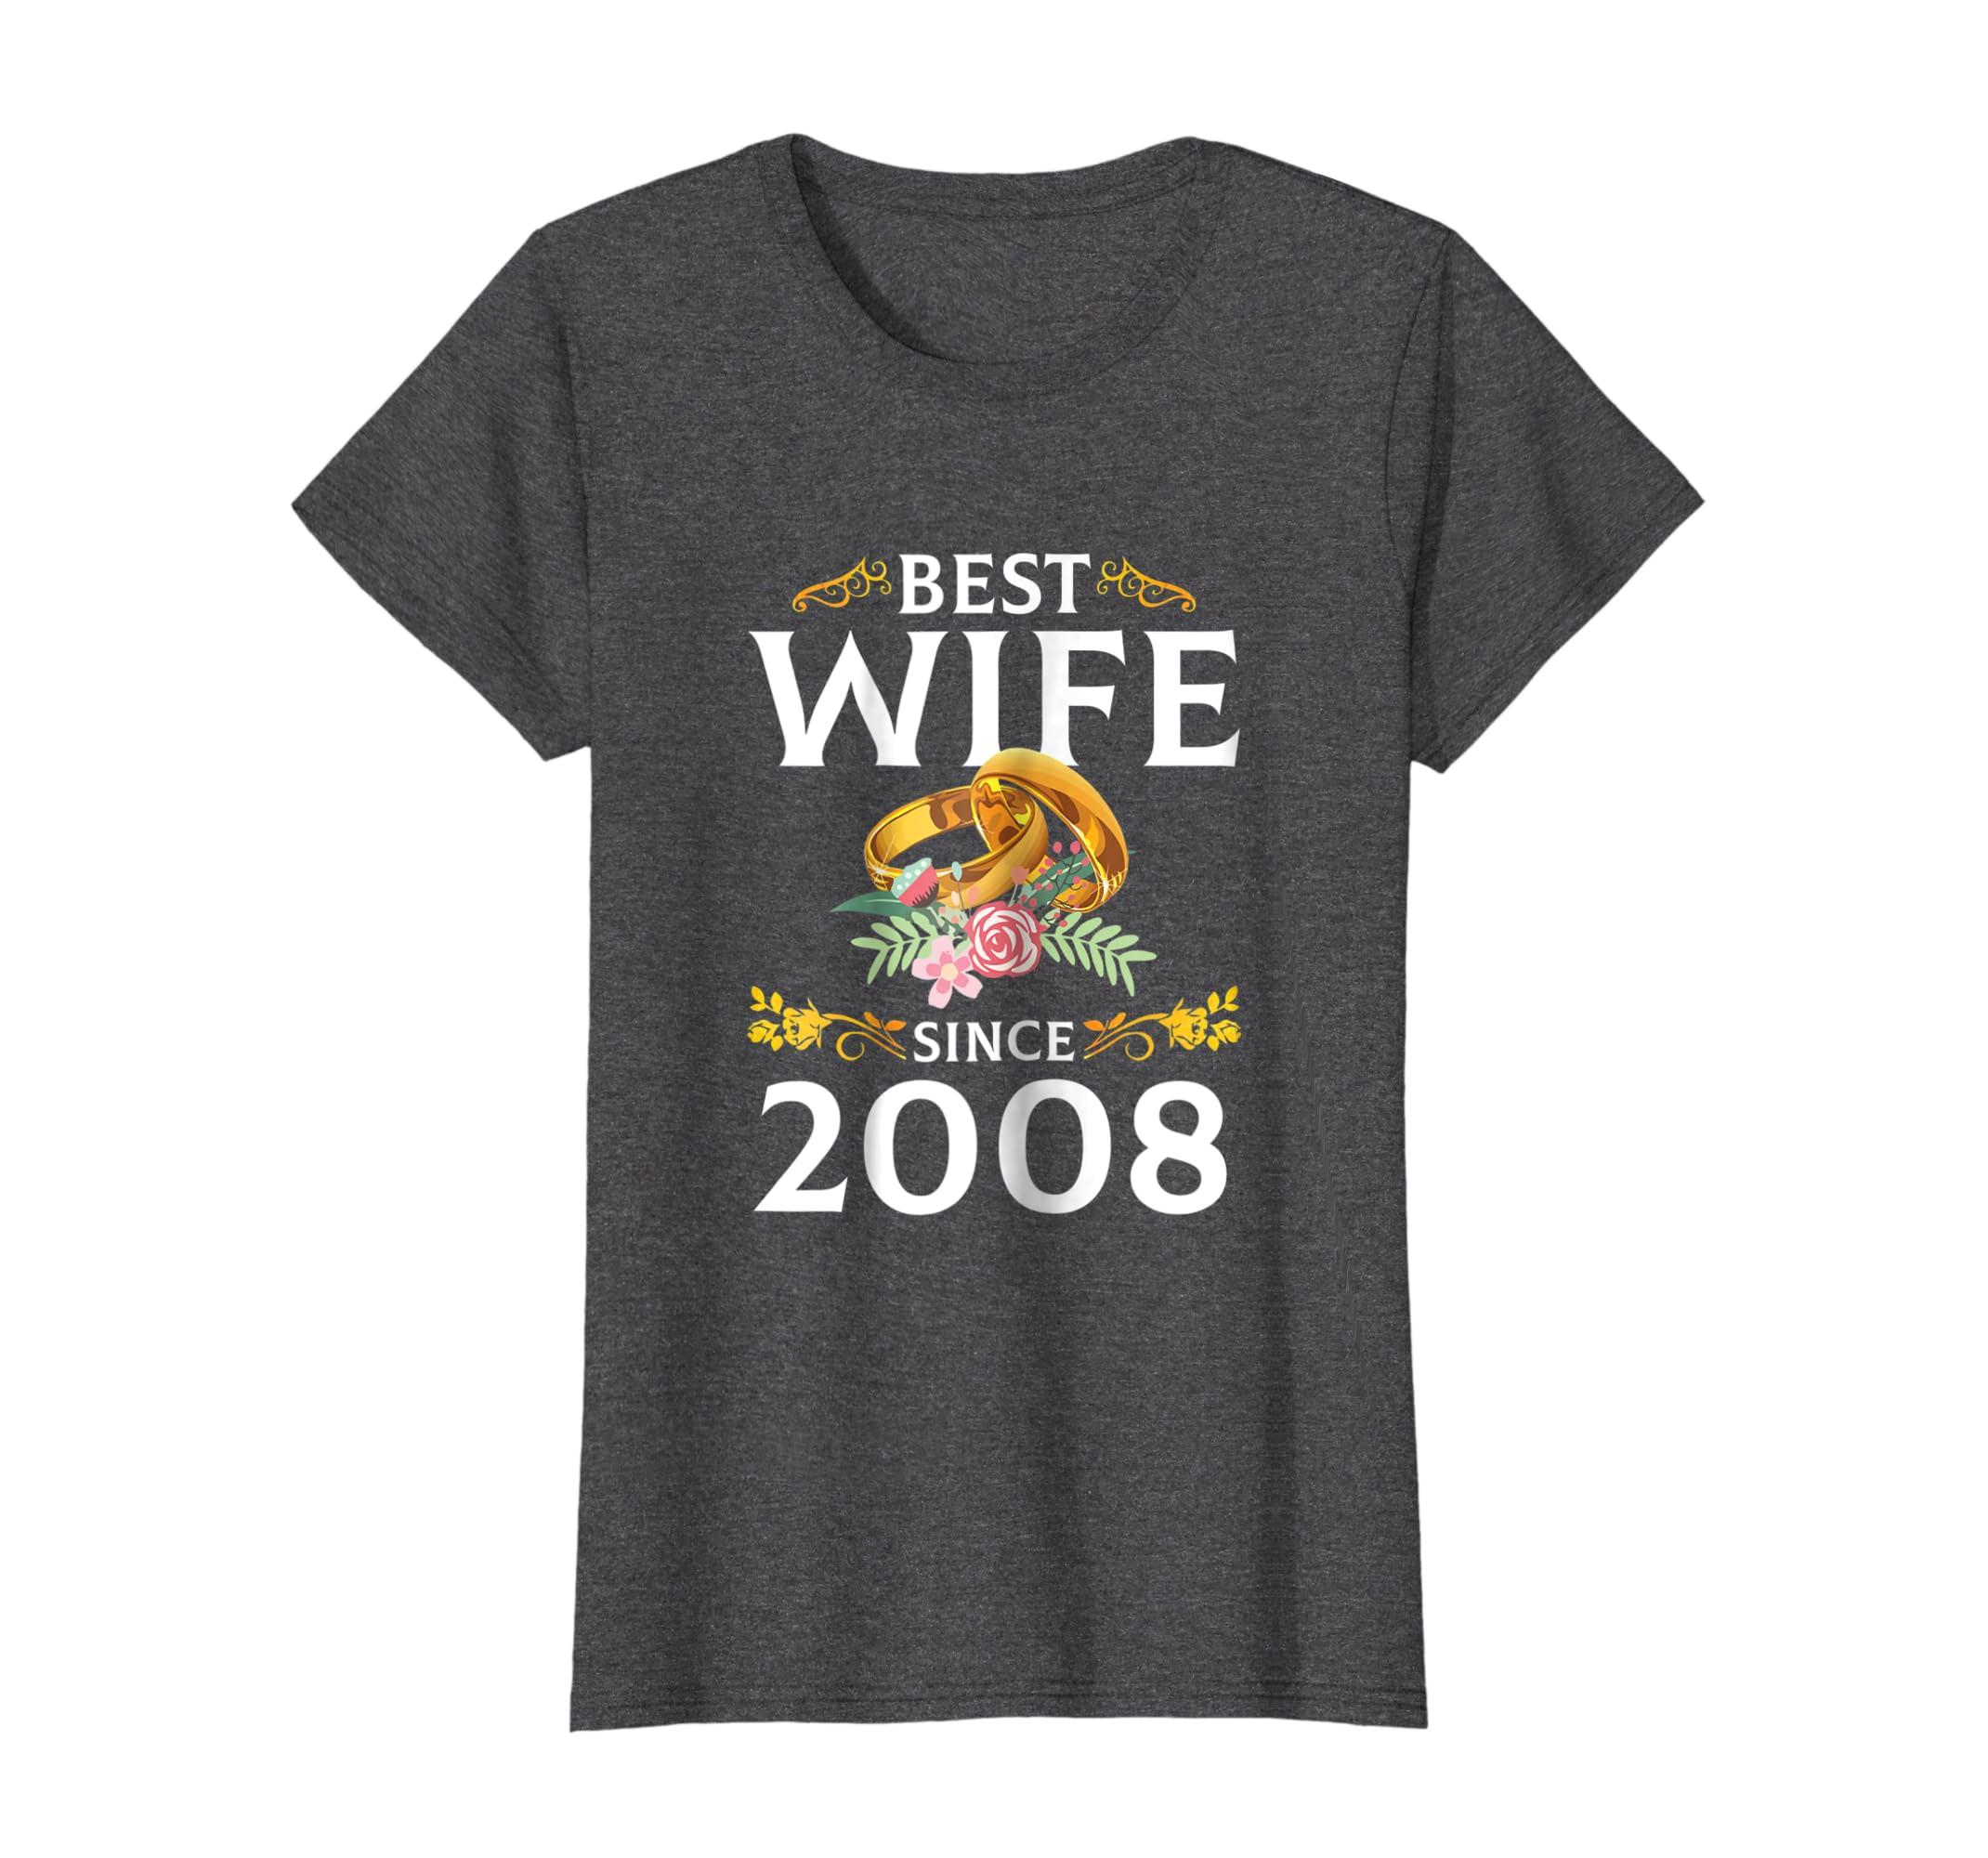 Womens Best Wife Since 2008 Shirt 10th Year Wedding Anniversary